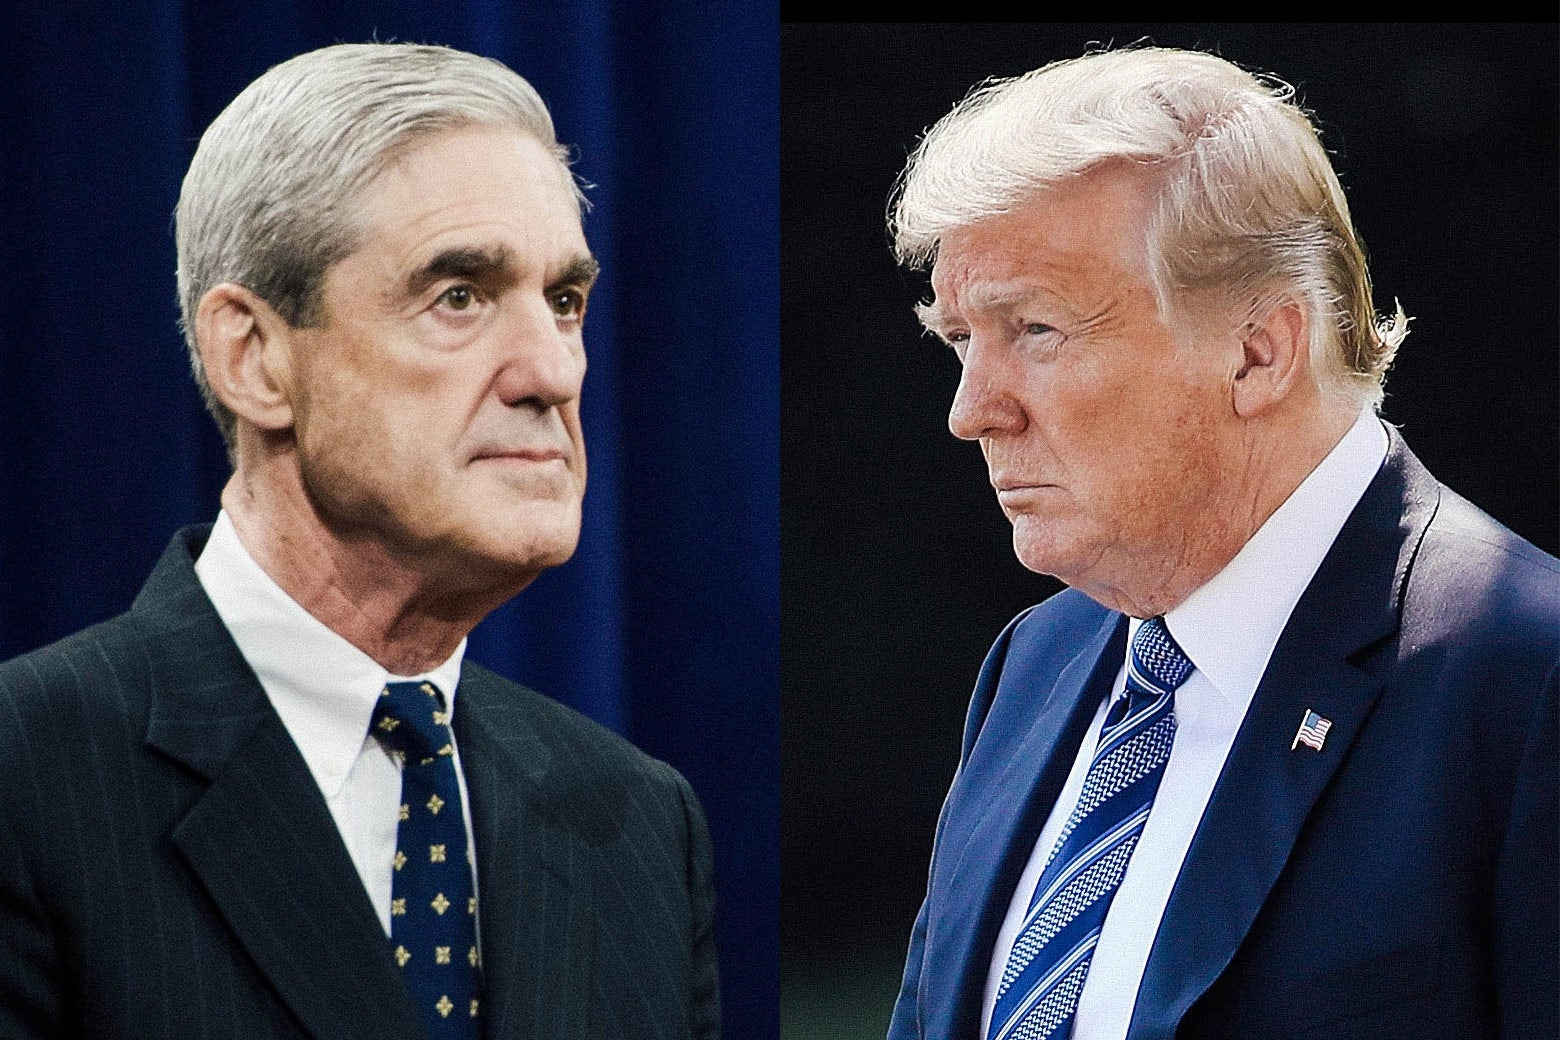 Robert Mueller and Donald Trump.